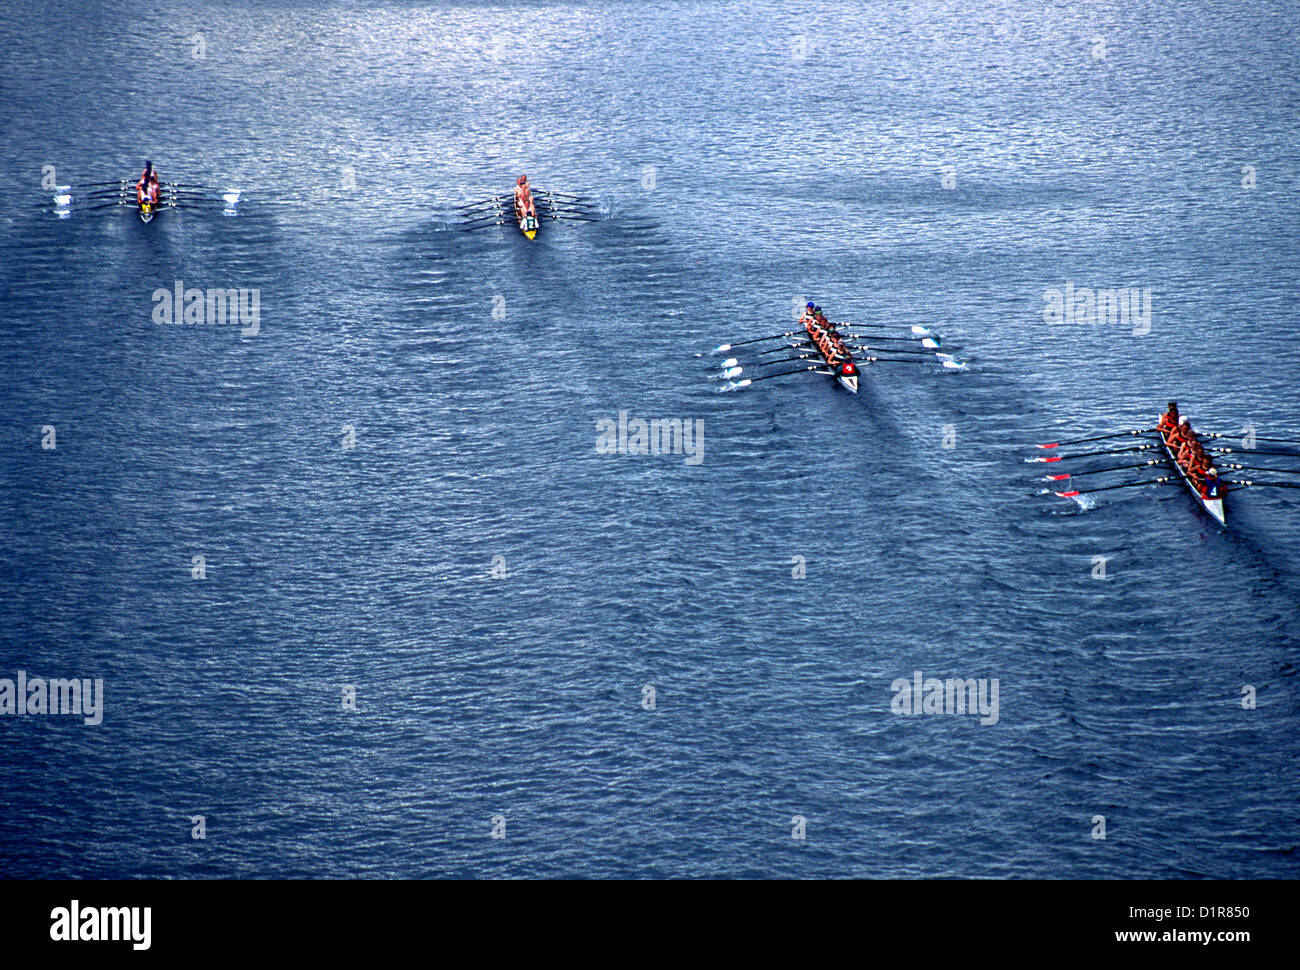 Crew Race, Seattle, Wa - Stock Image